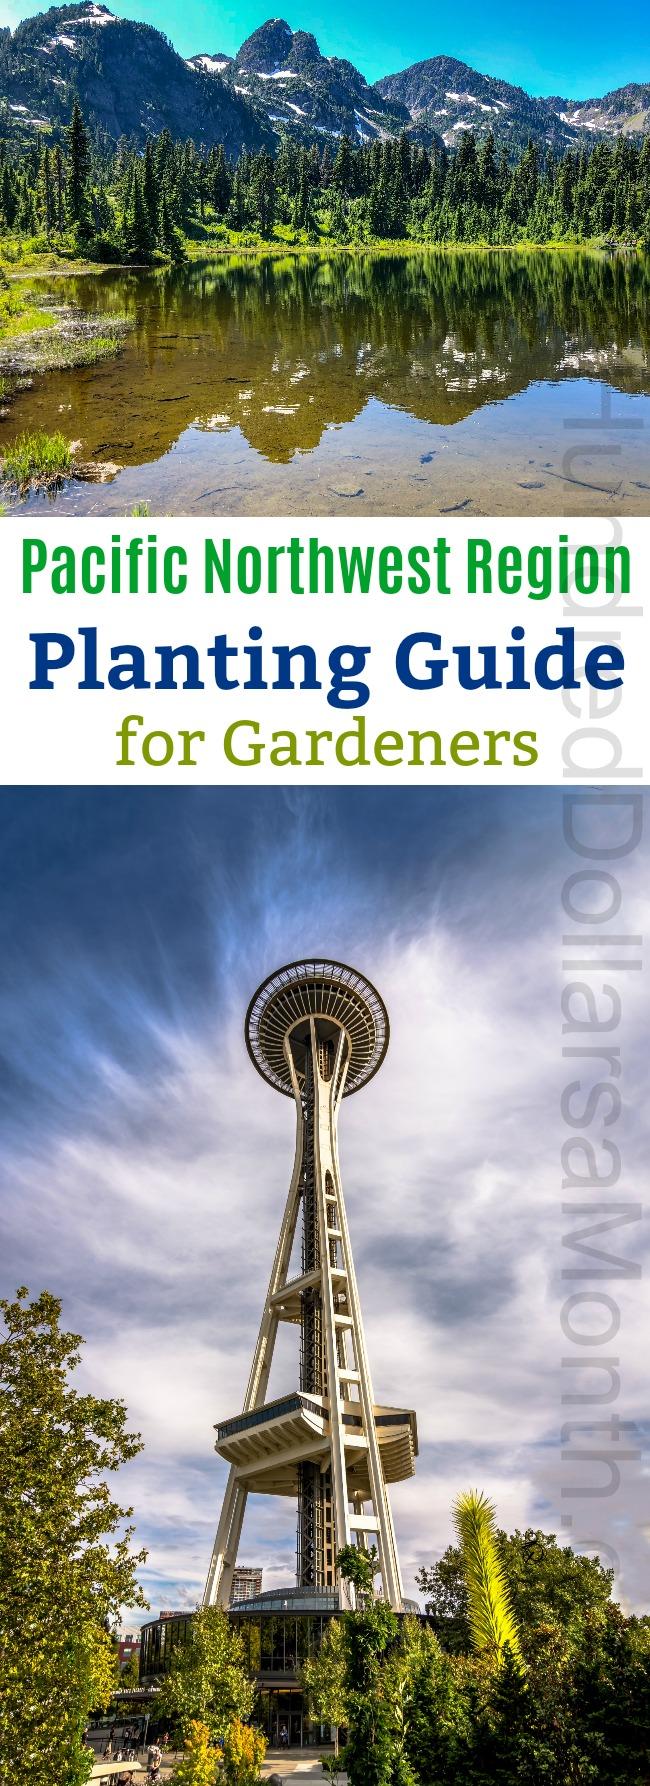 Pacific Northwest Region Planting Guide